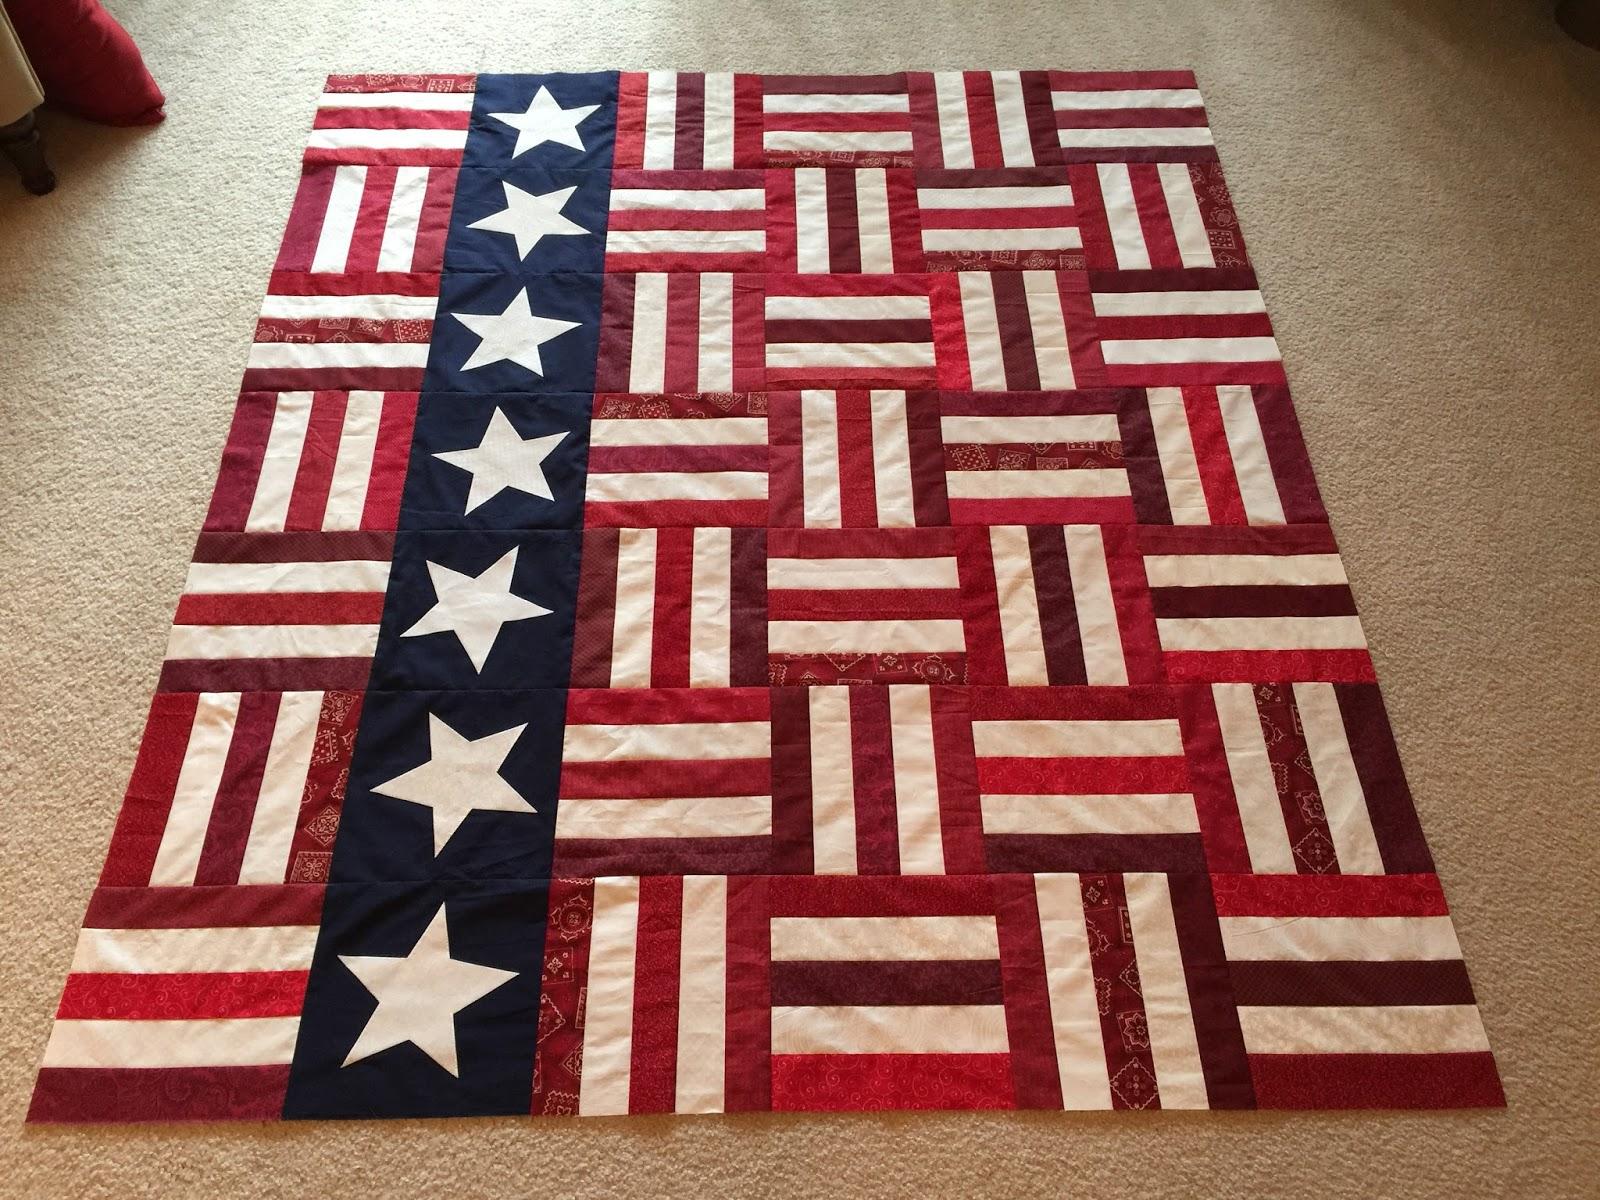 Suzy s Quilting Room: QOV - Stars and Stripes Pattern